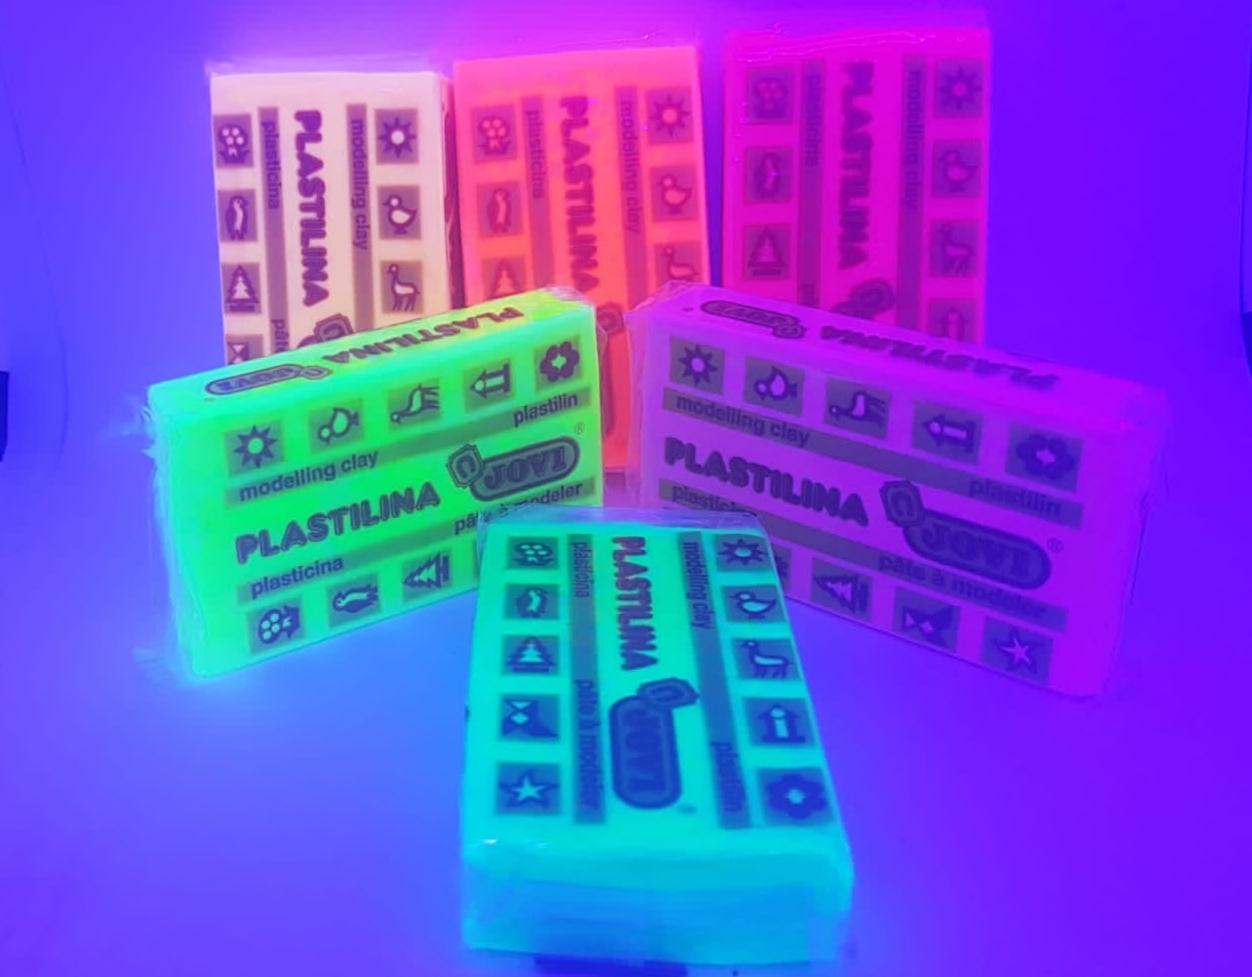 Plastilina fluorescente